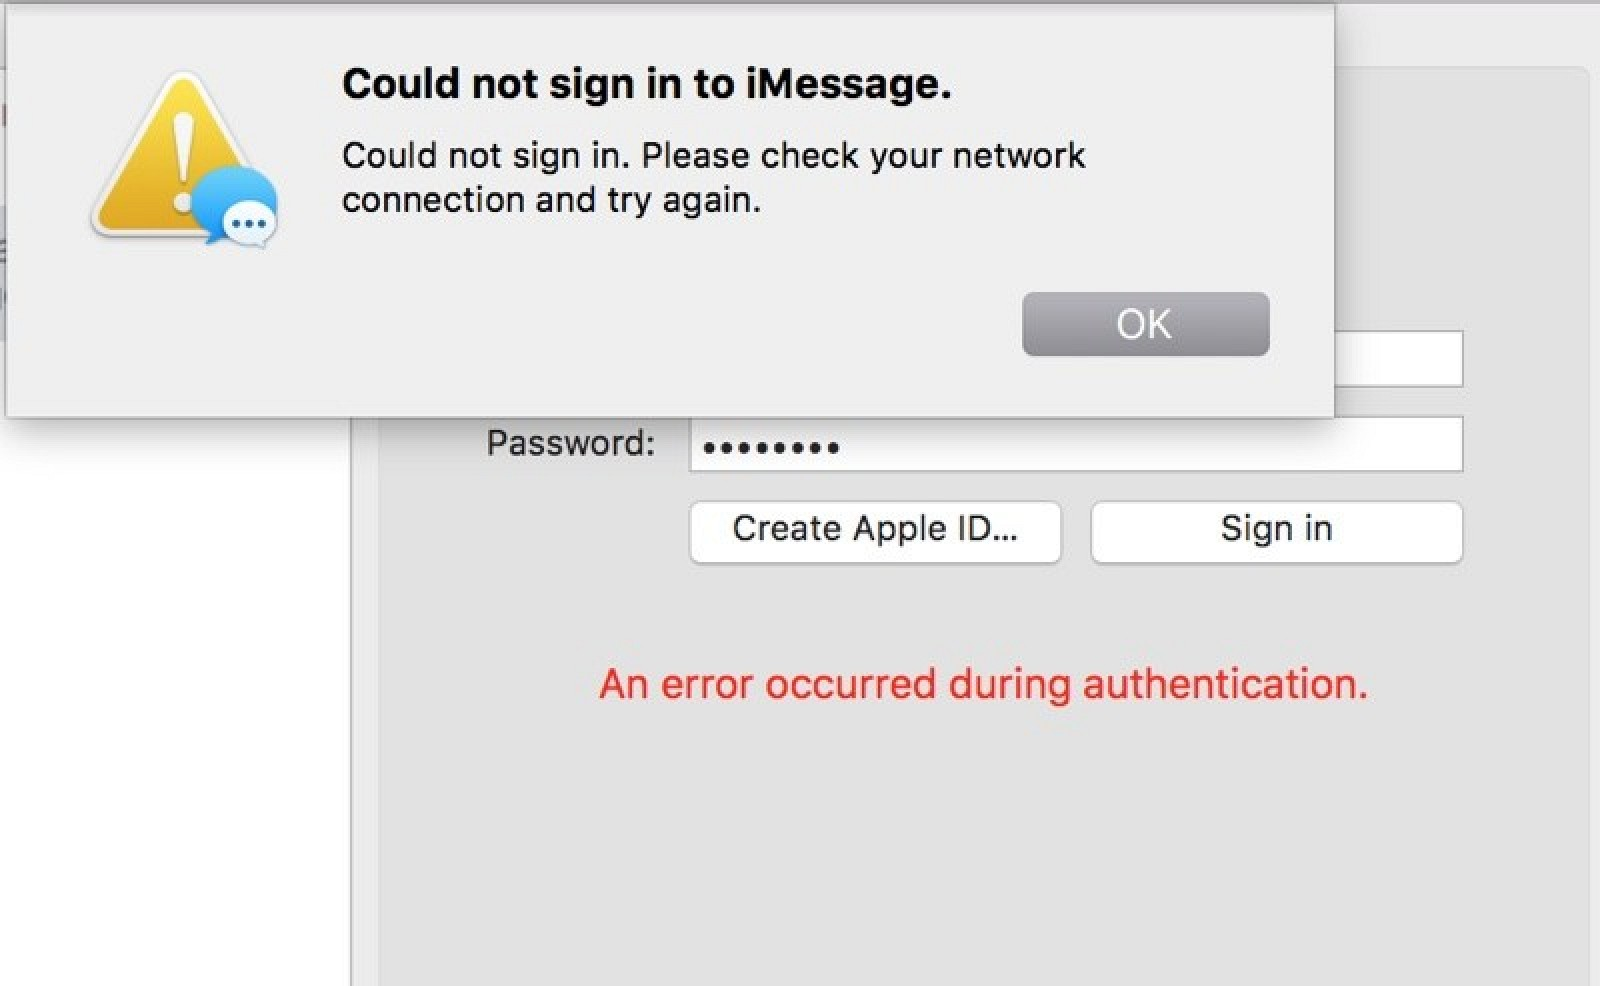 messagesactivationerror-800x493.jpg